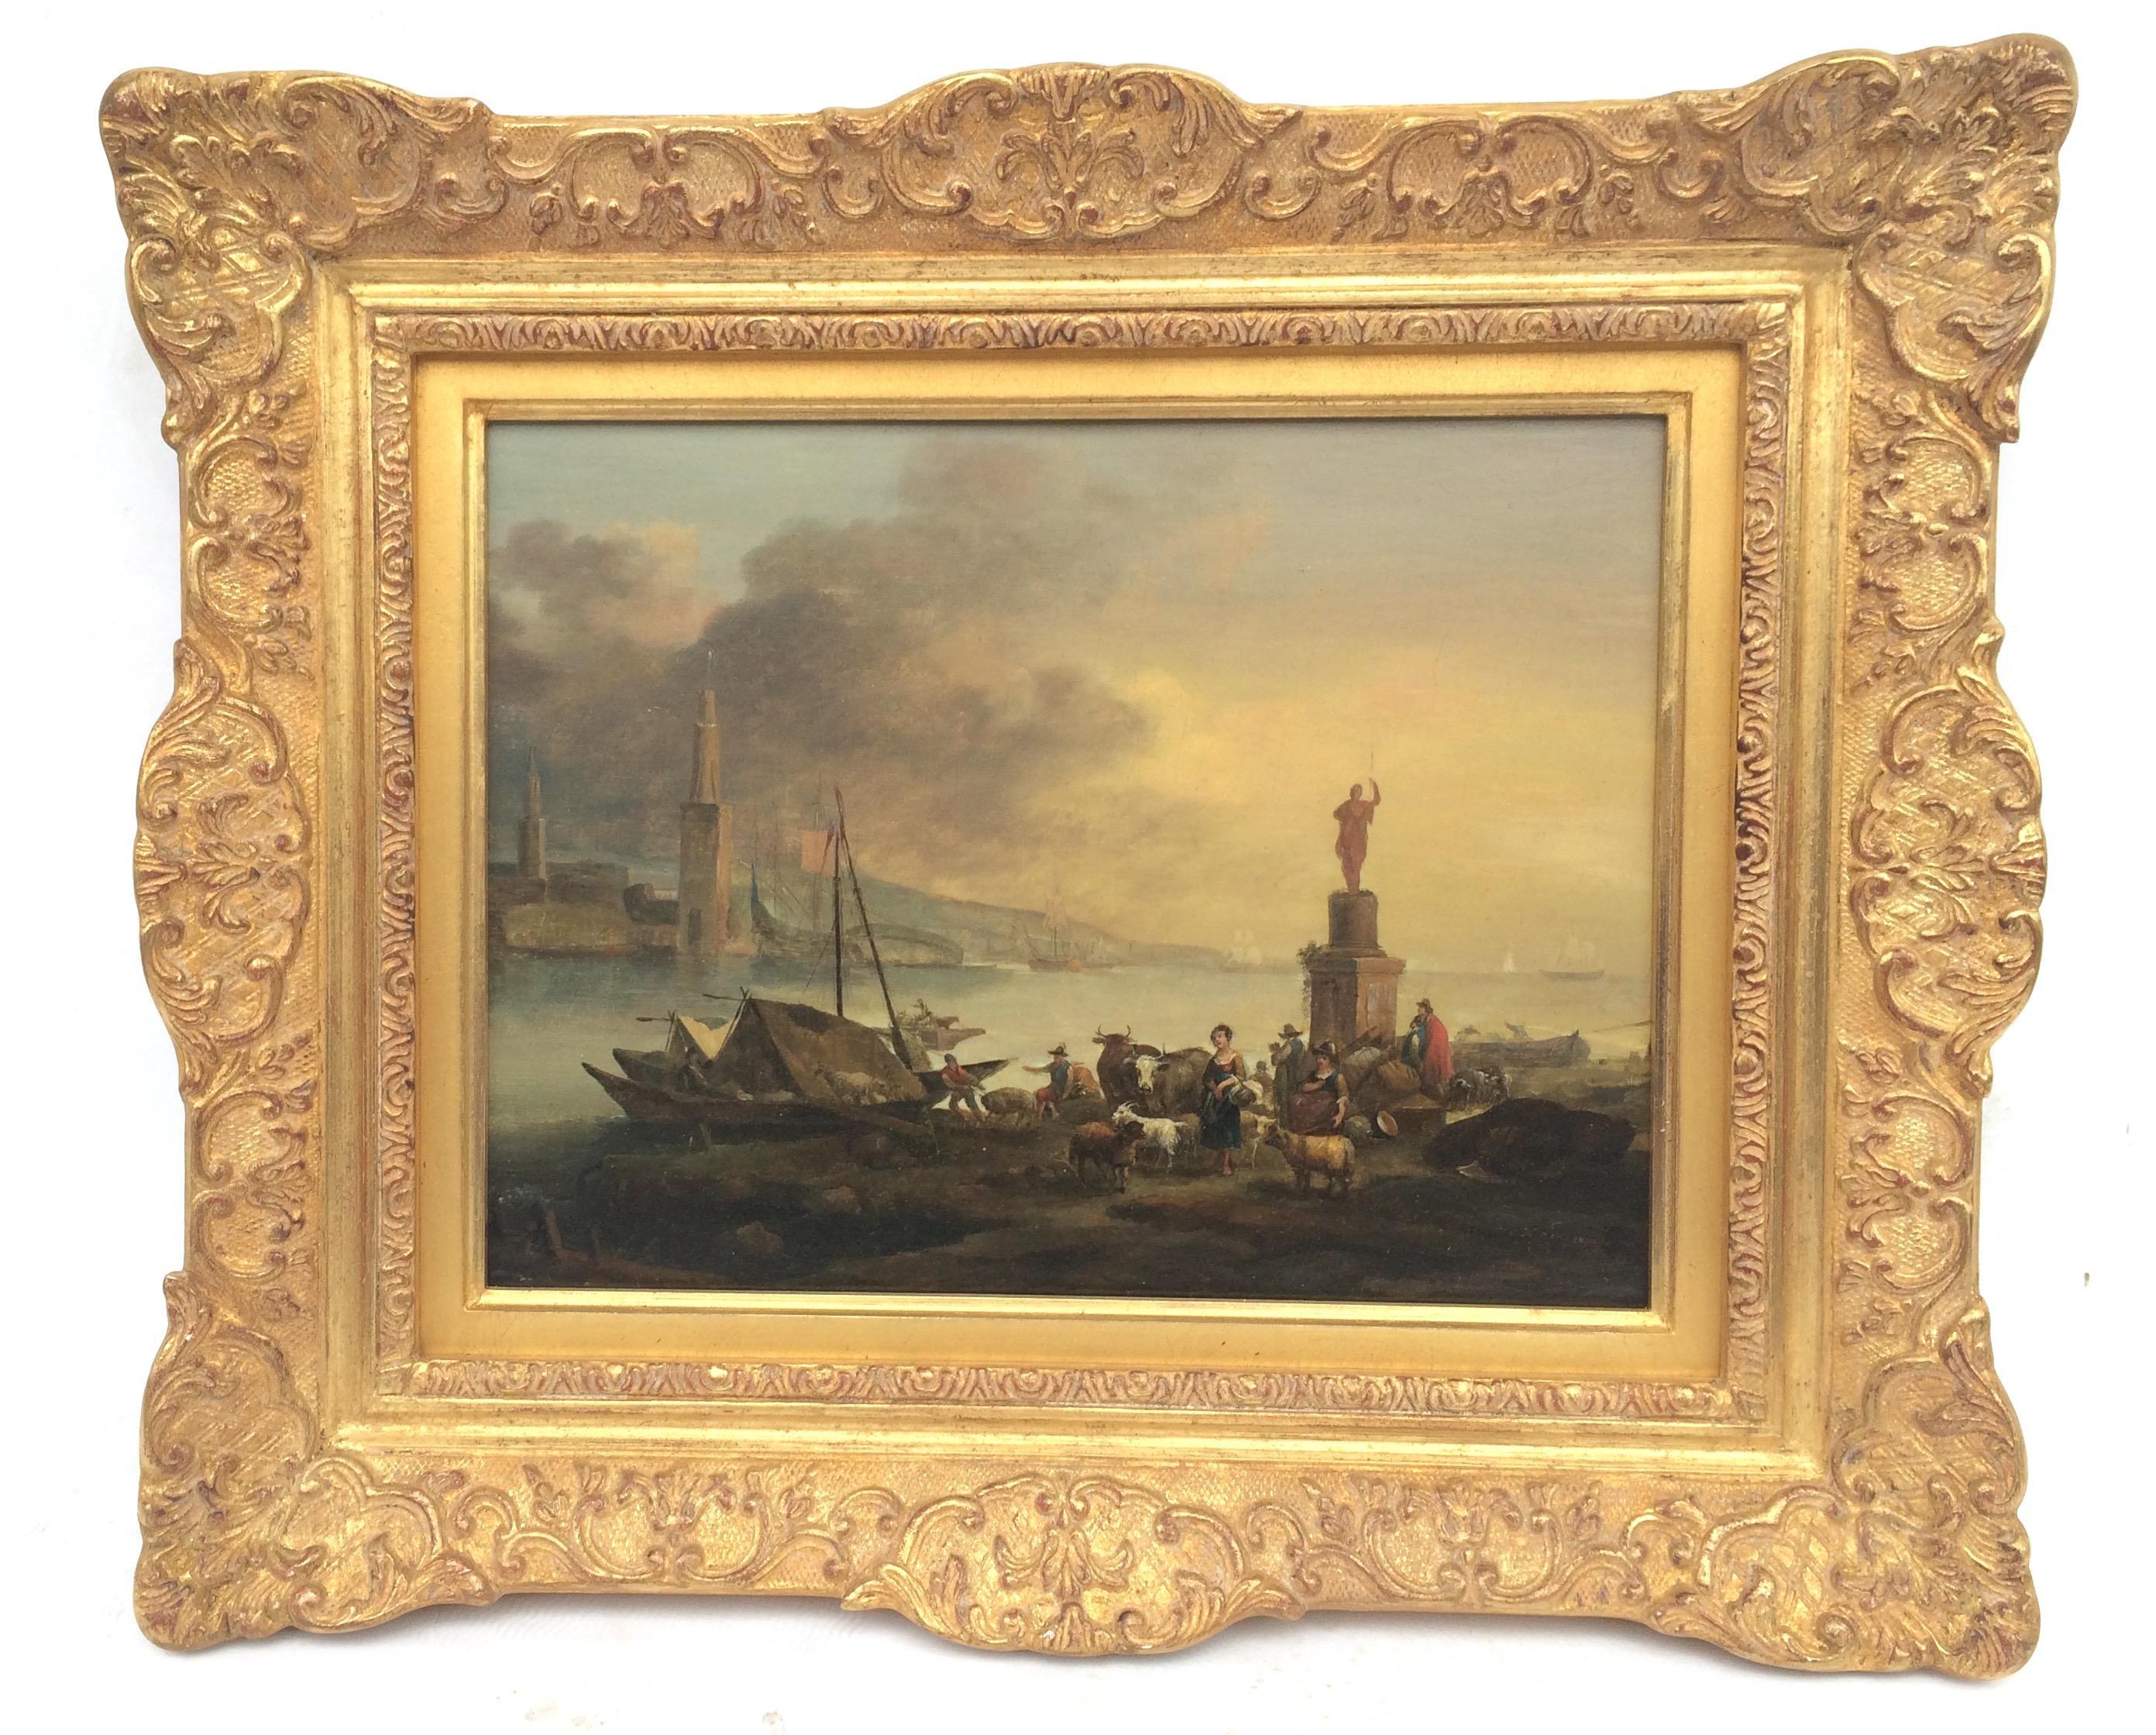 Dutch School 18th Century - Lively Marine